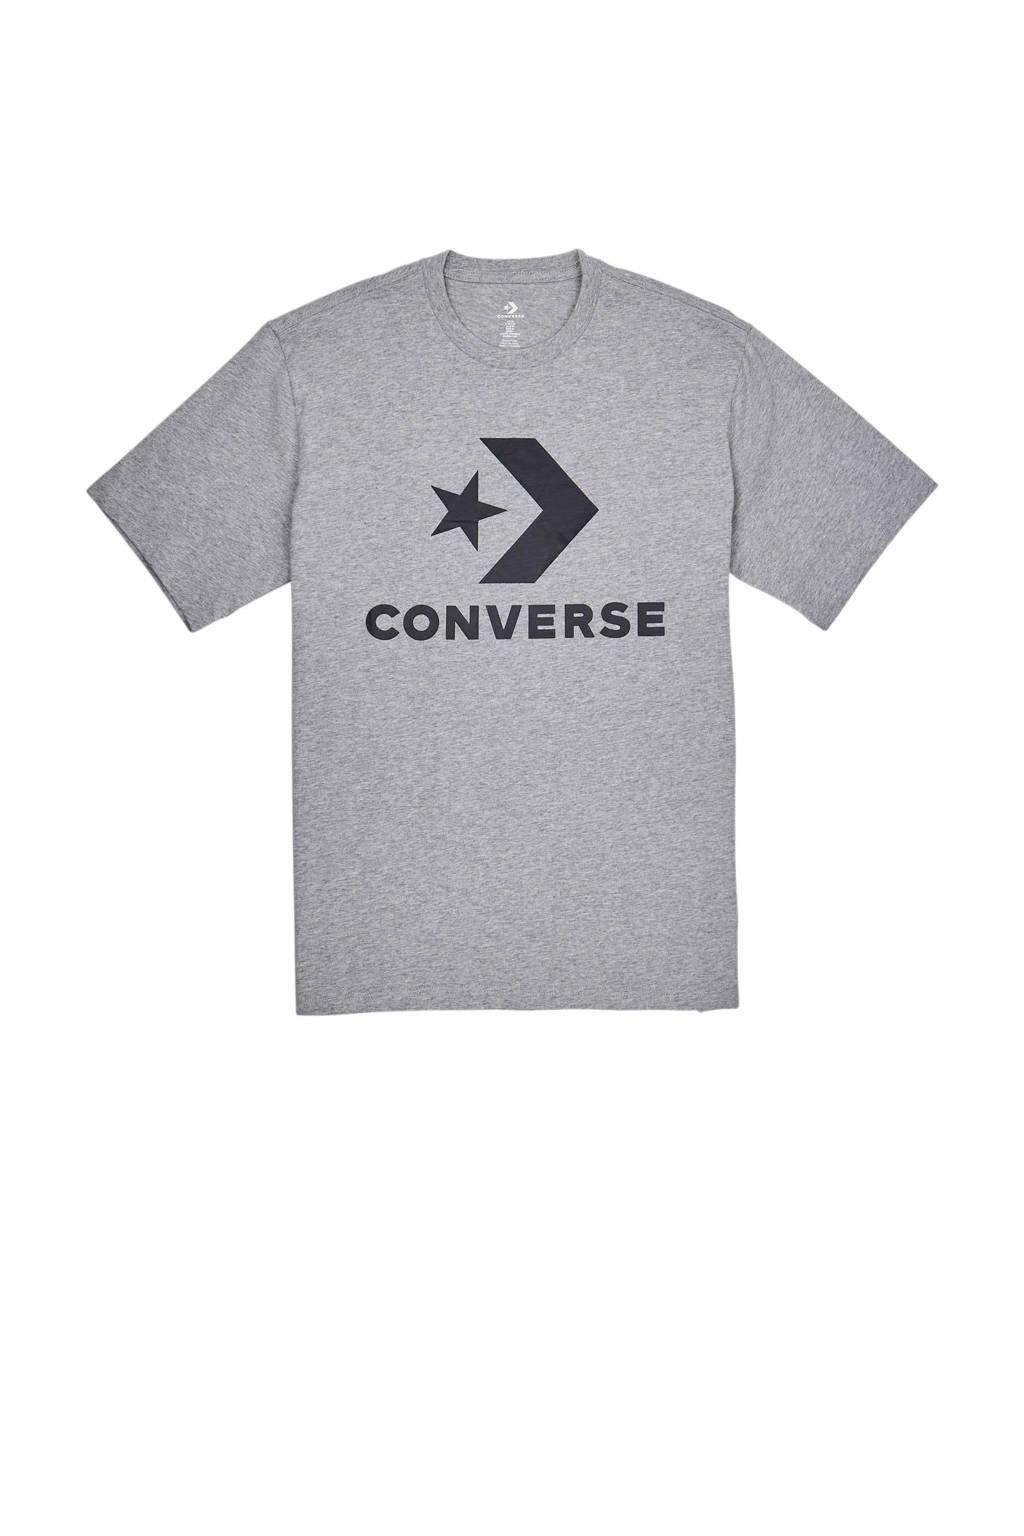 Converse   T-shirt grijs, Grijs